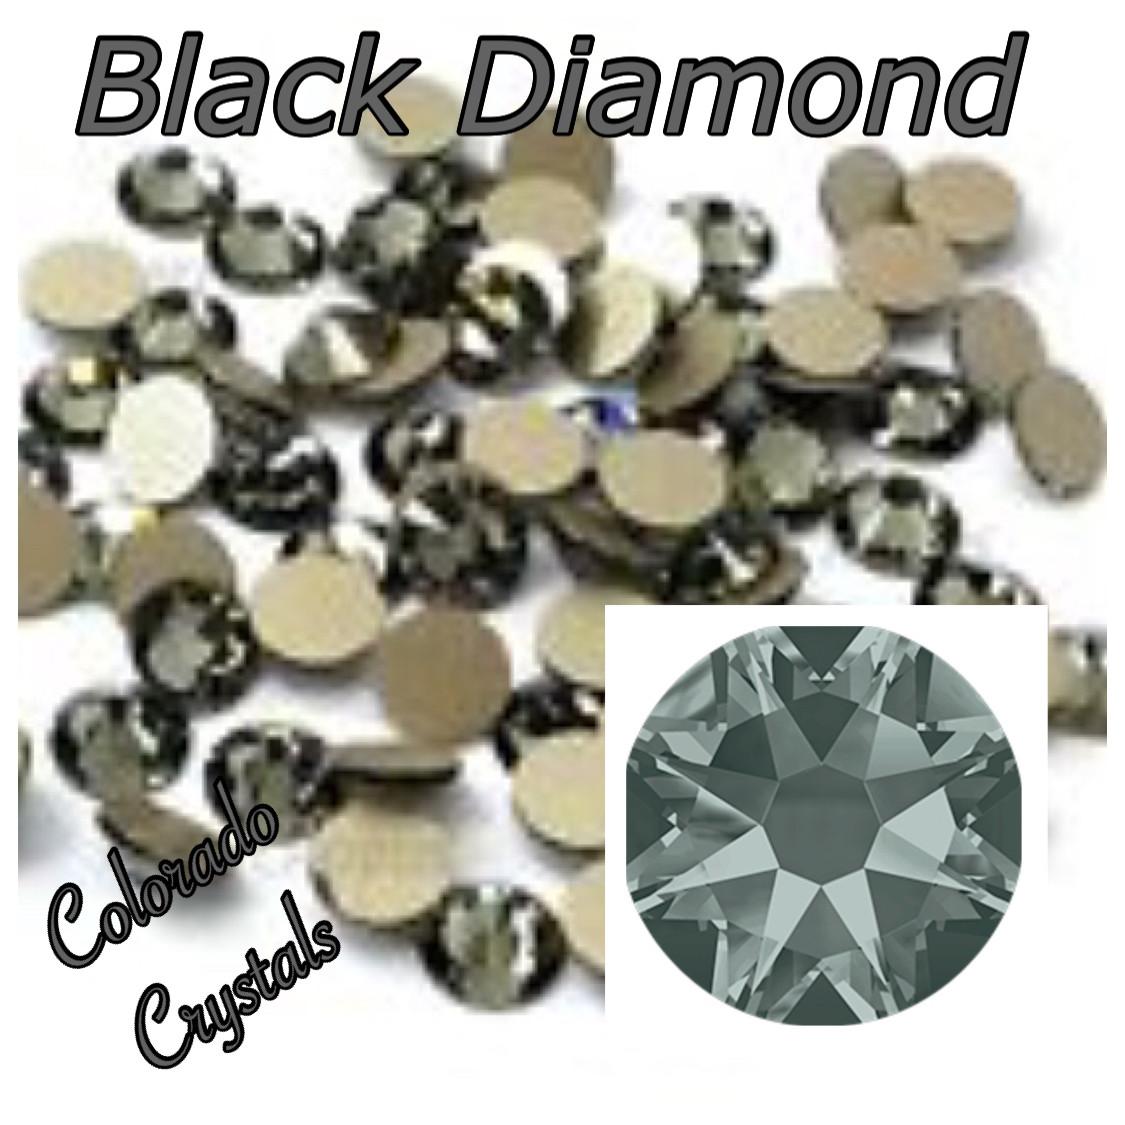 Black Diamond 16ss 2088 Limited